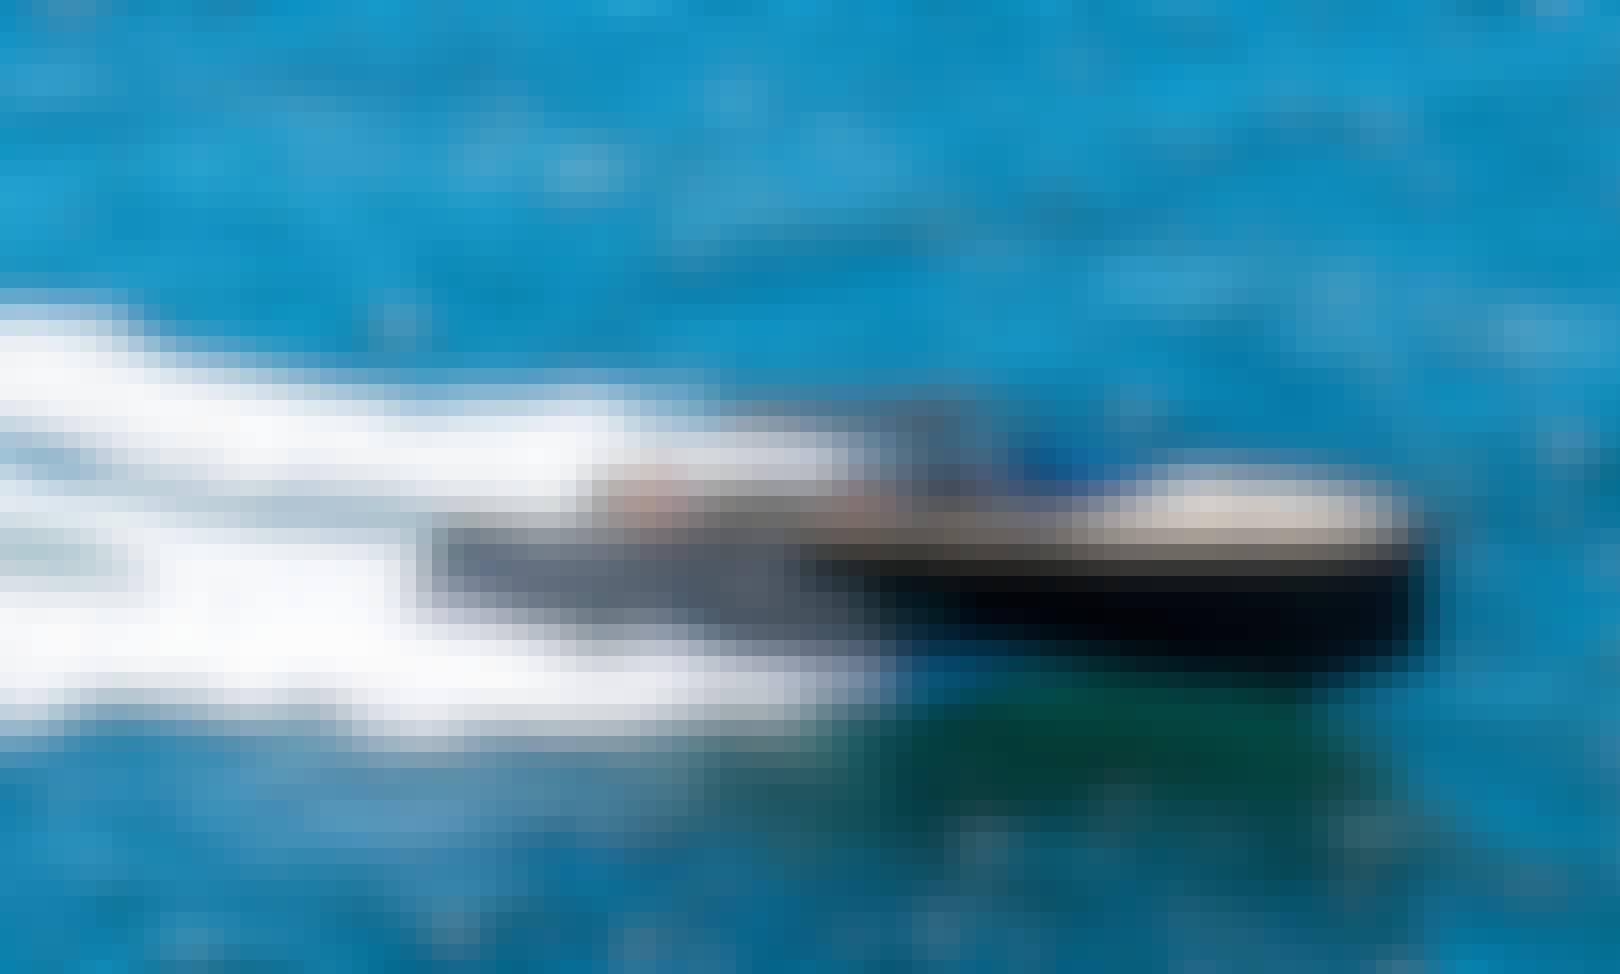 Colnago 45 Open Motor Yacht Rental for Up to 12 People in Split or Hvar, Croatia